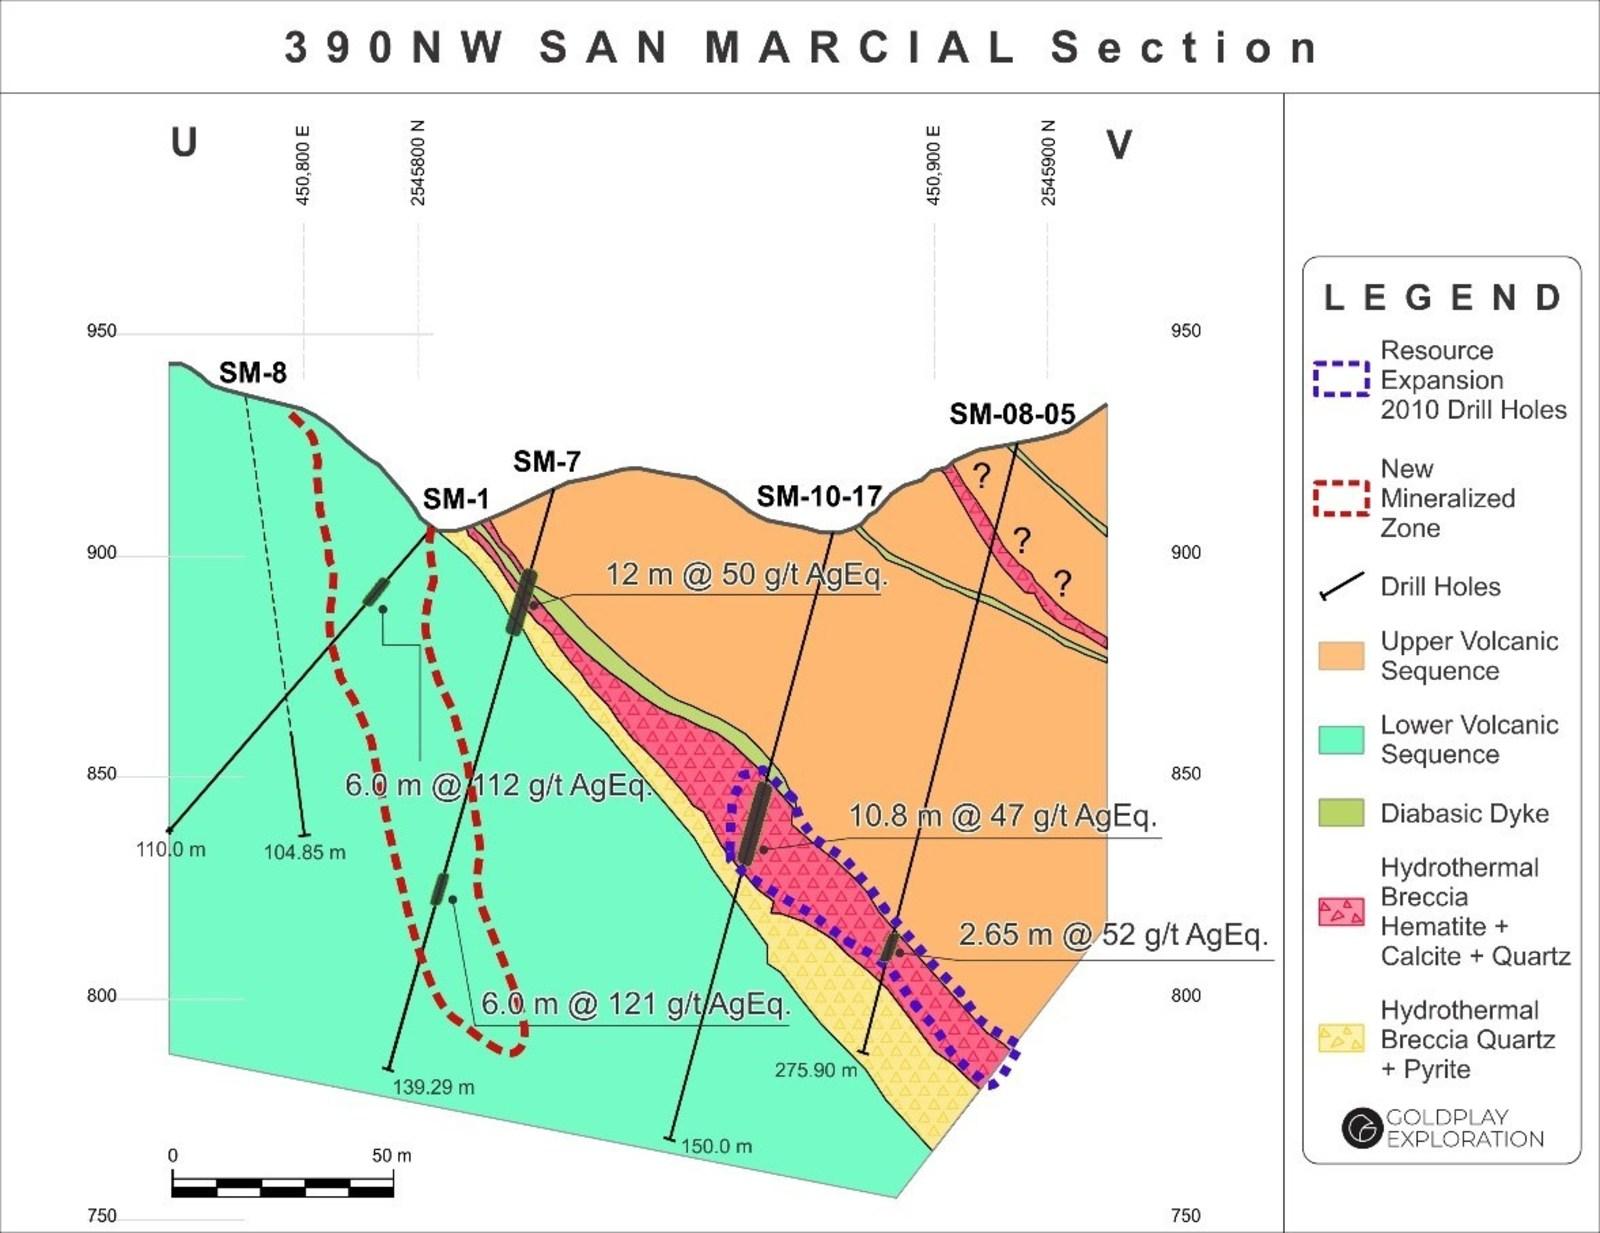 Figure 6: San Marcial Cross Section U-V